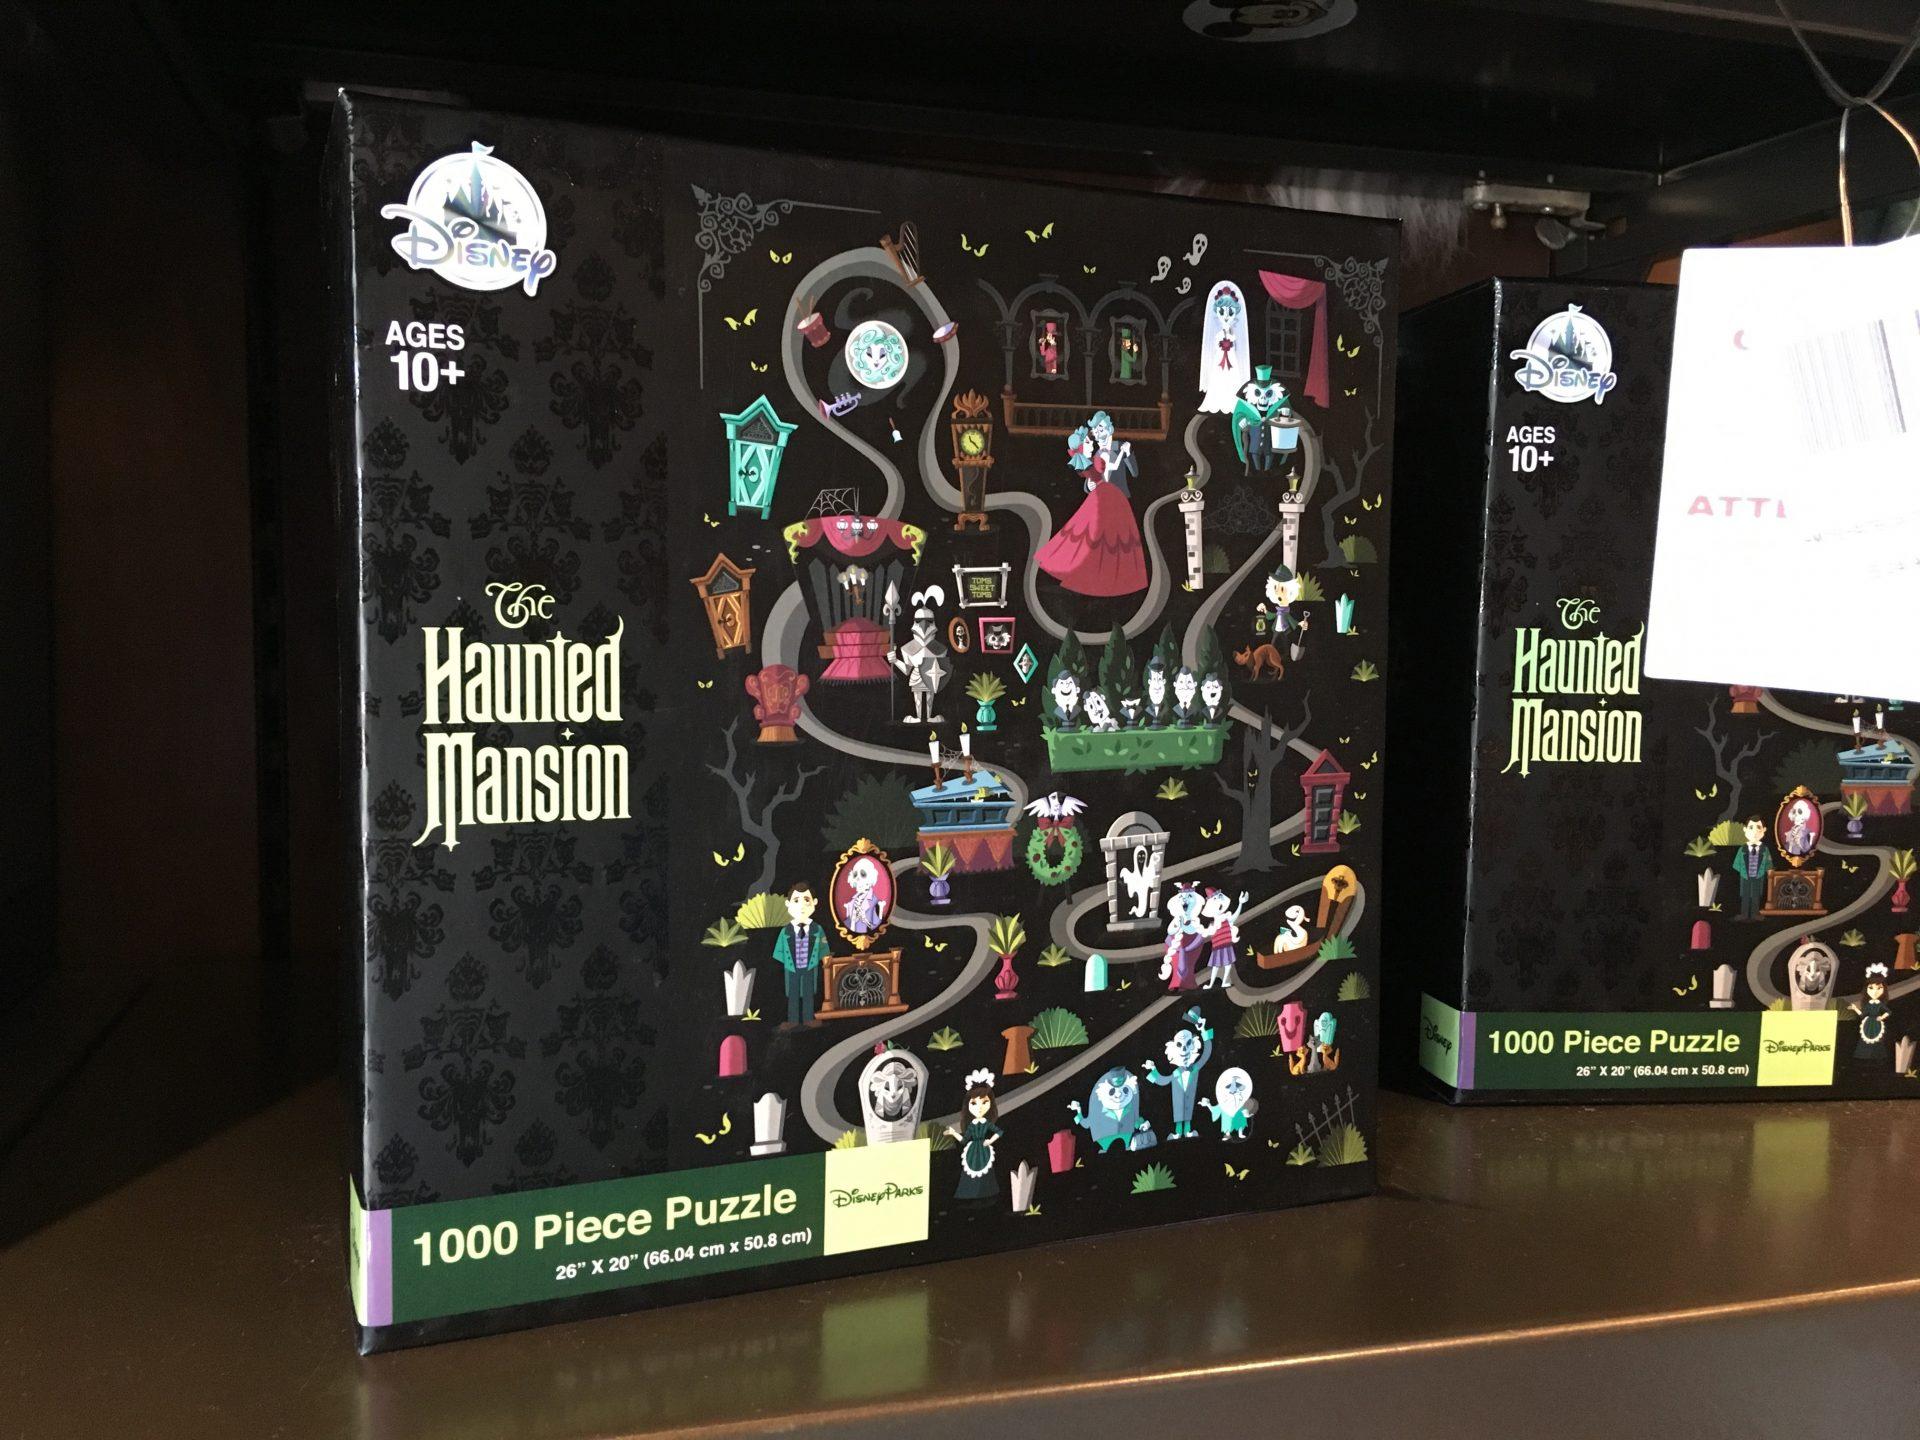 Haunted Mansion 1000 piece puzzle